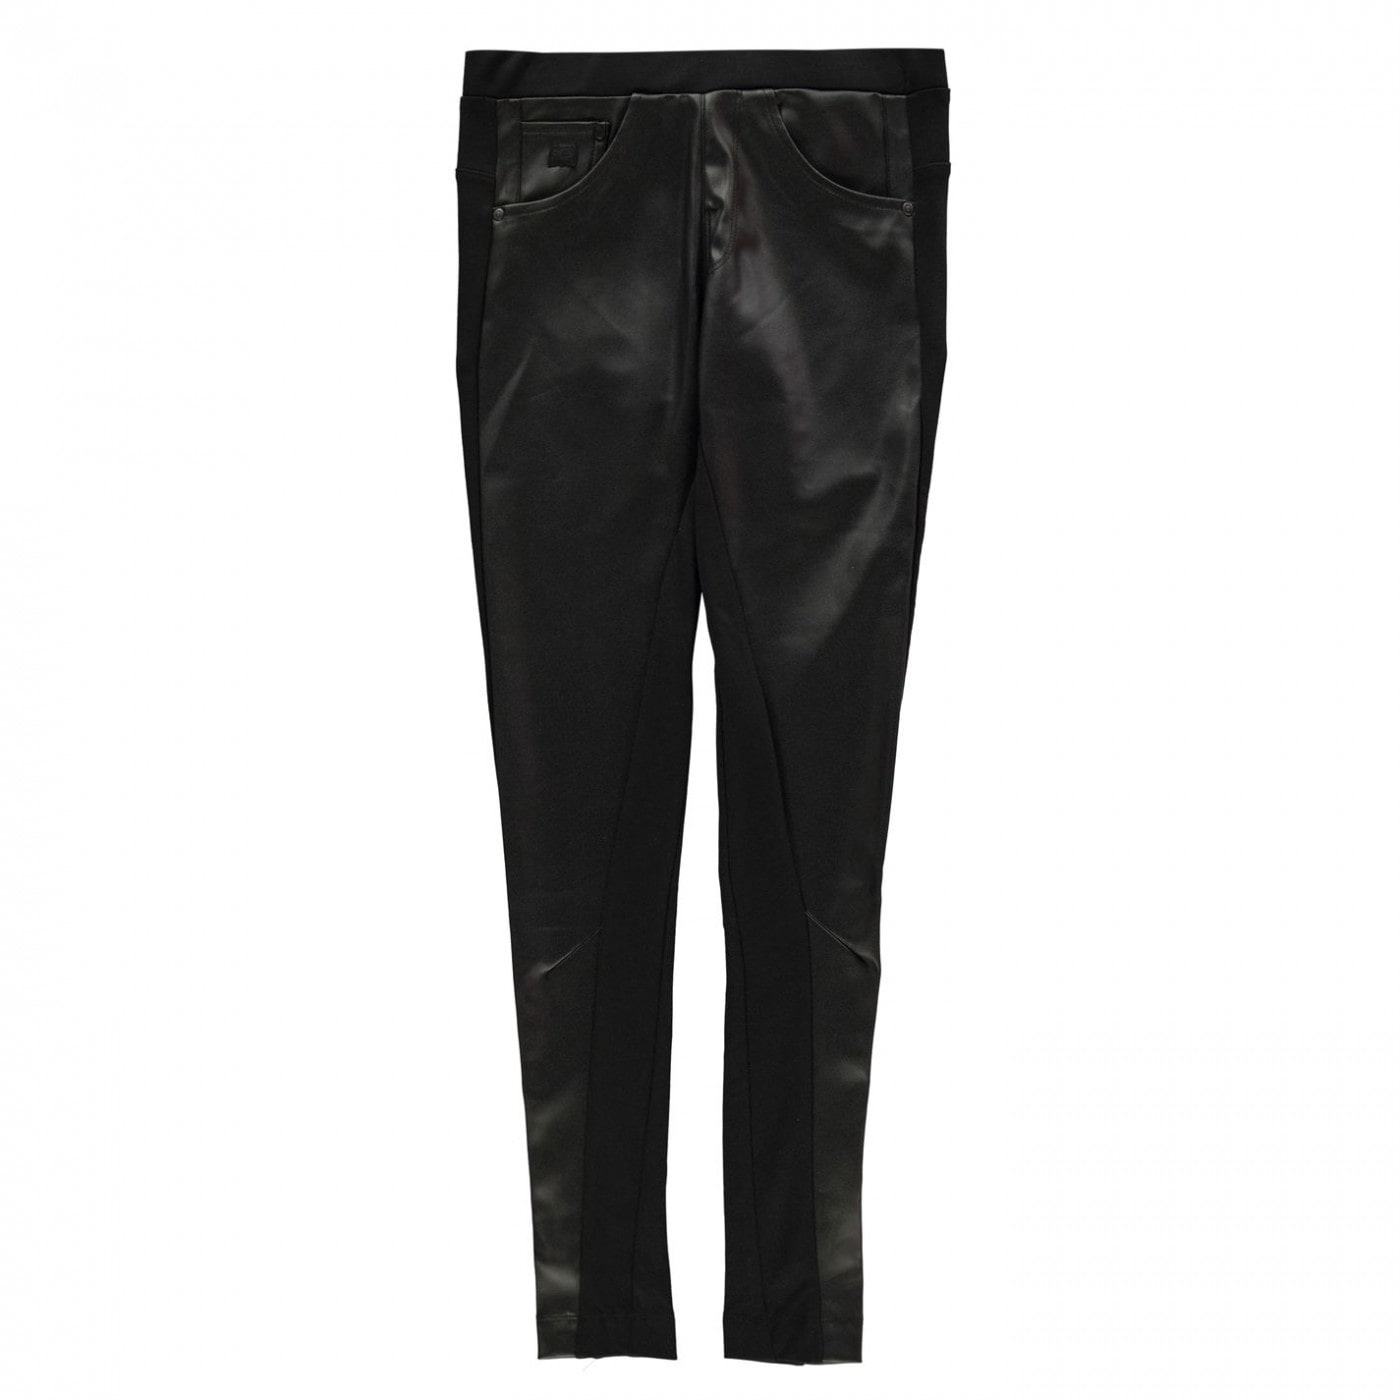 G Star 915005 Jeans